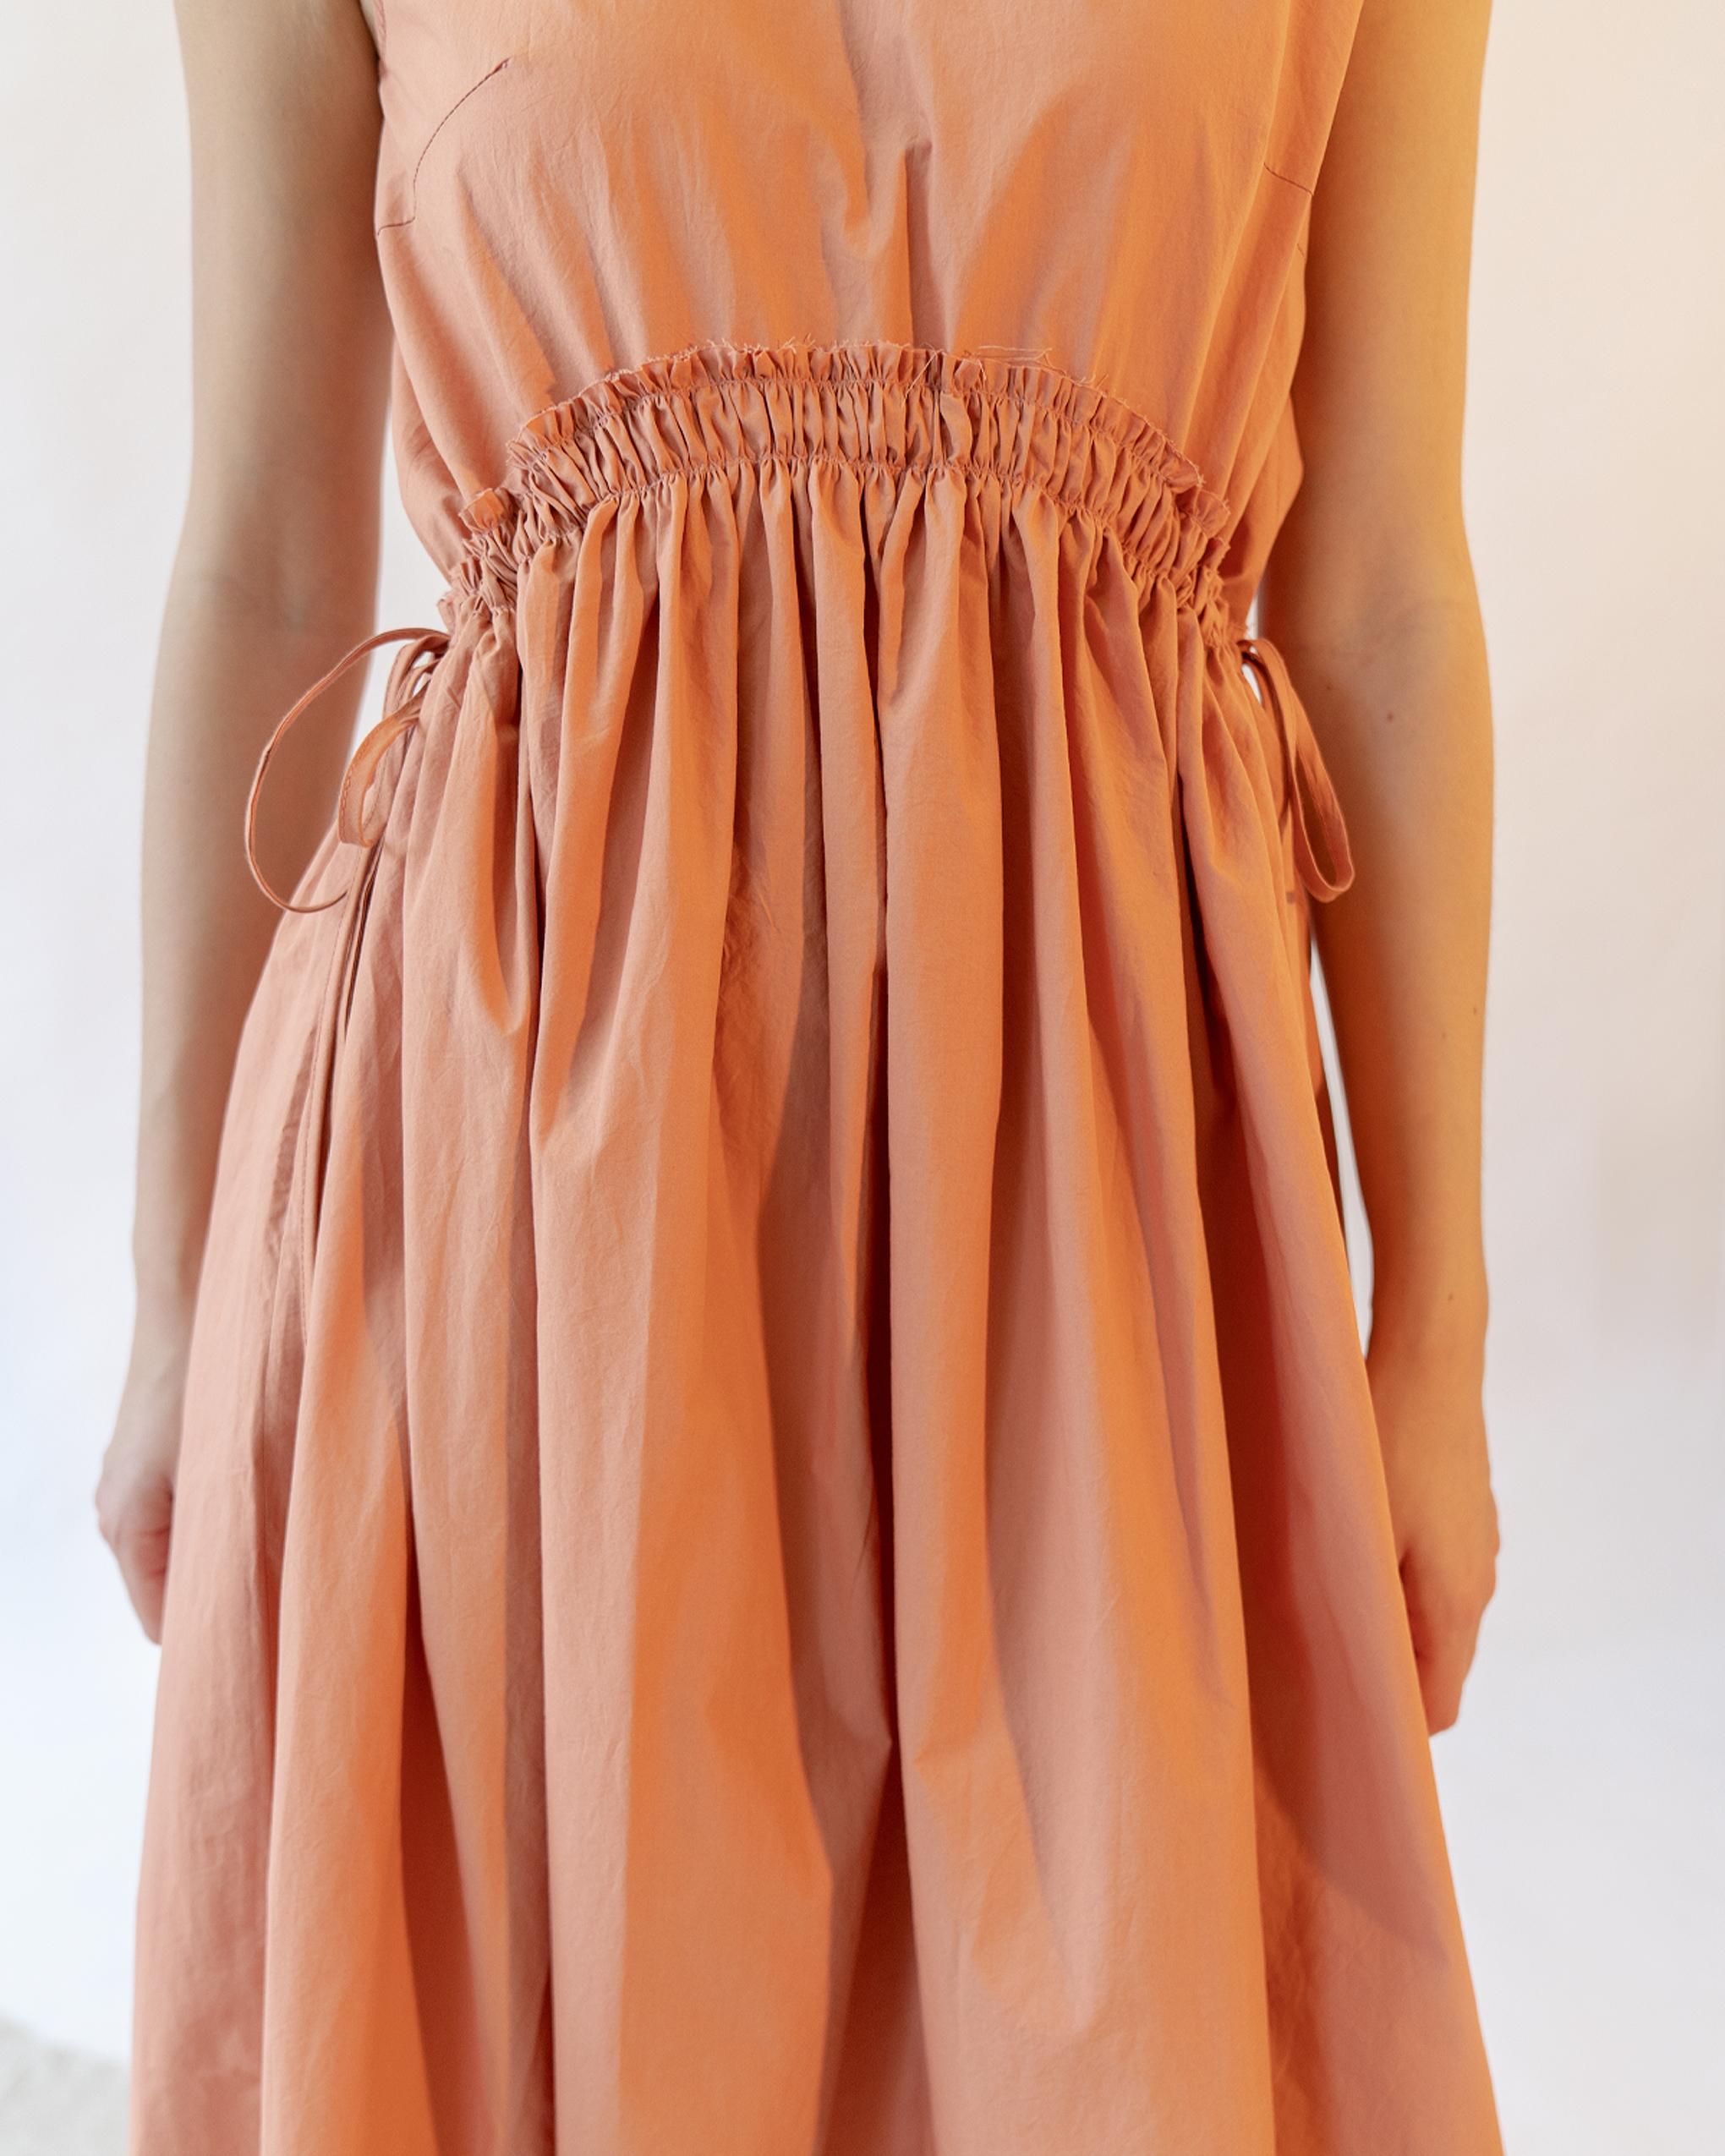 A woman is wearing an orange curved shirred waist side tie dress.